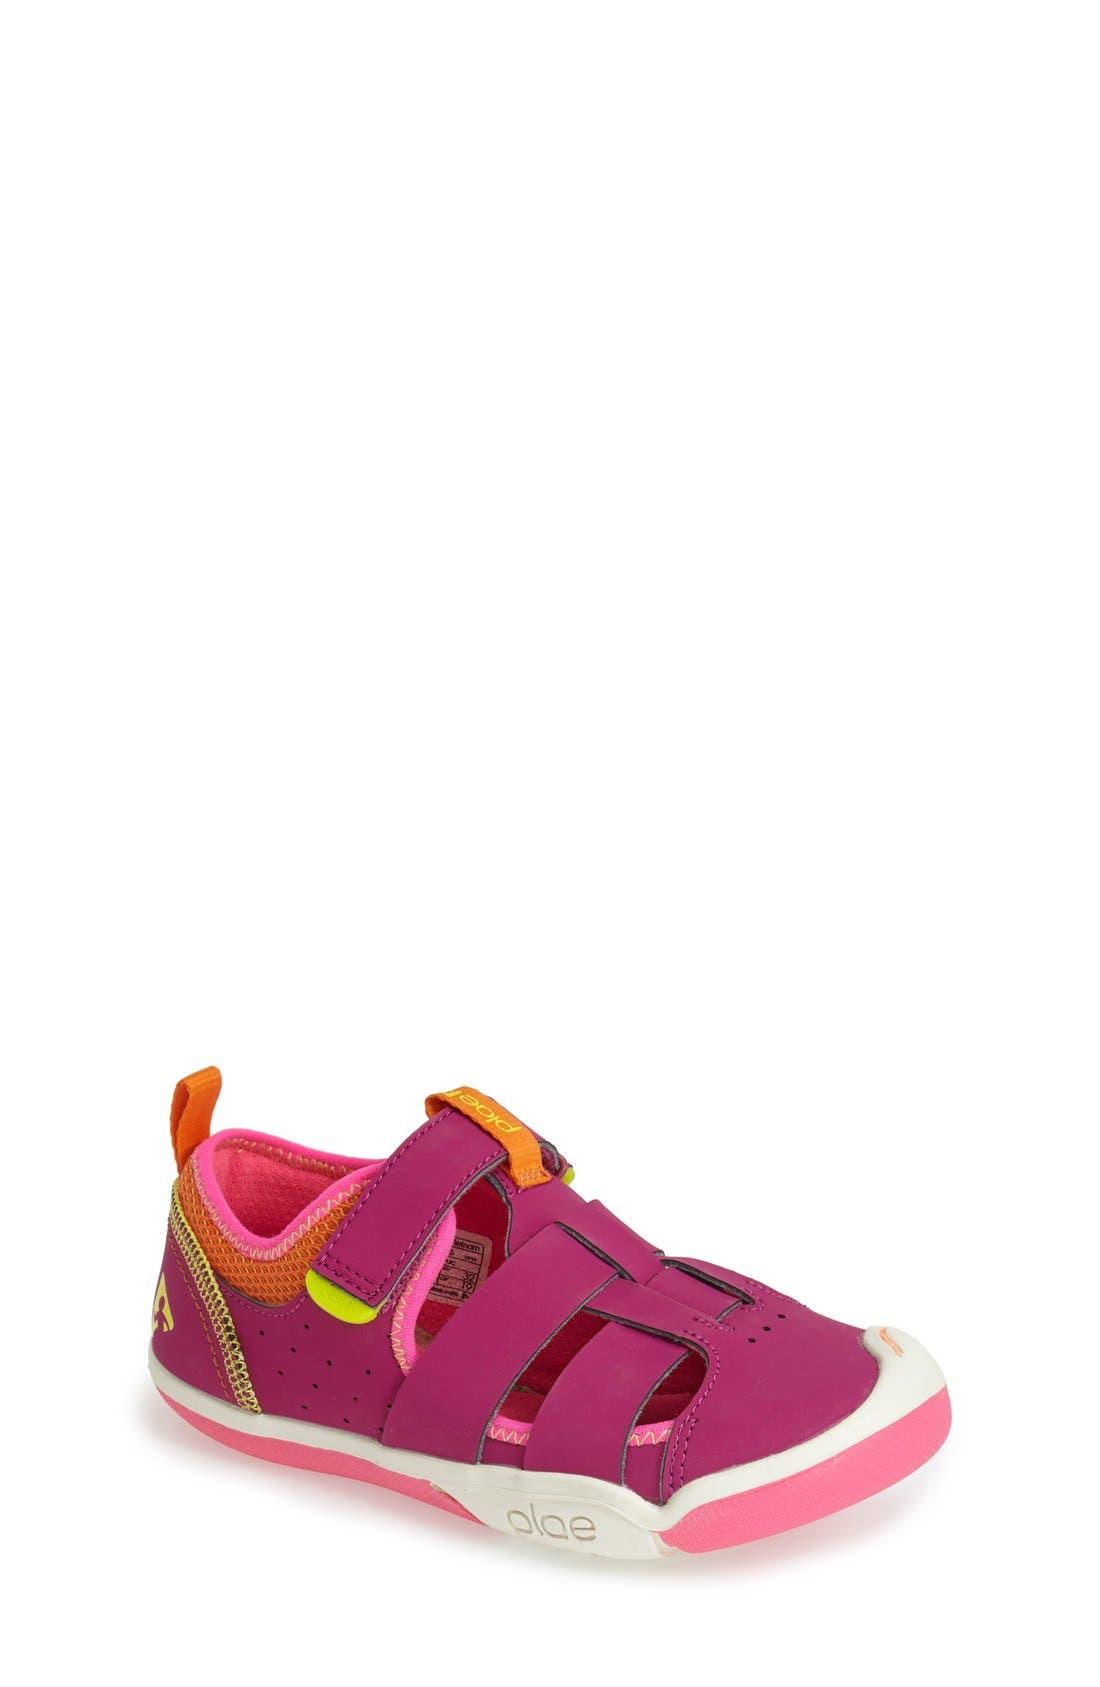 'Sam' Customizable Sneaker,                             Main thumbnail 1, color,                             Festival Fuchsia